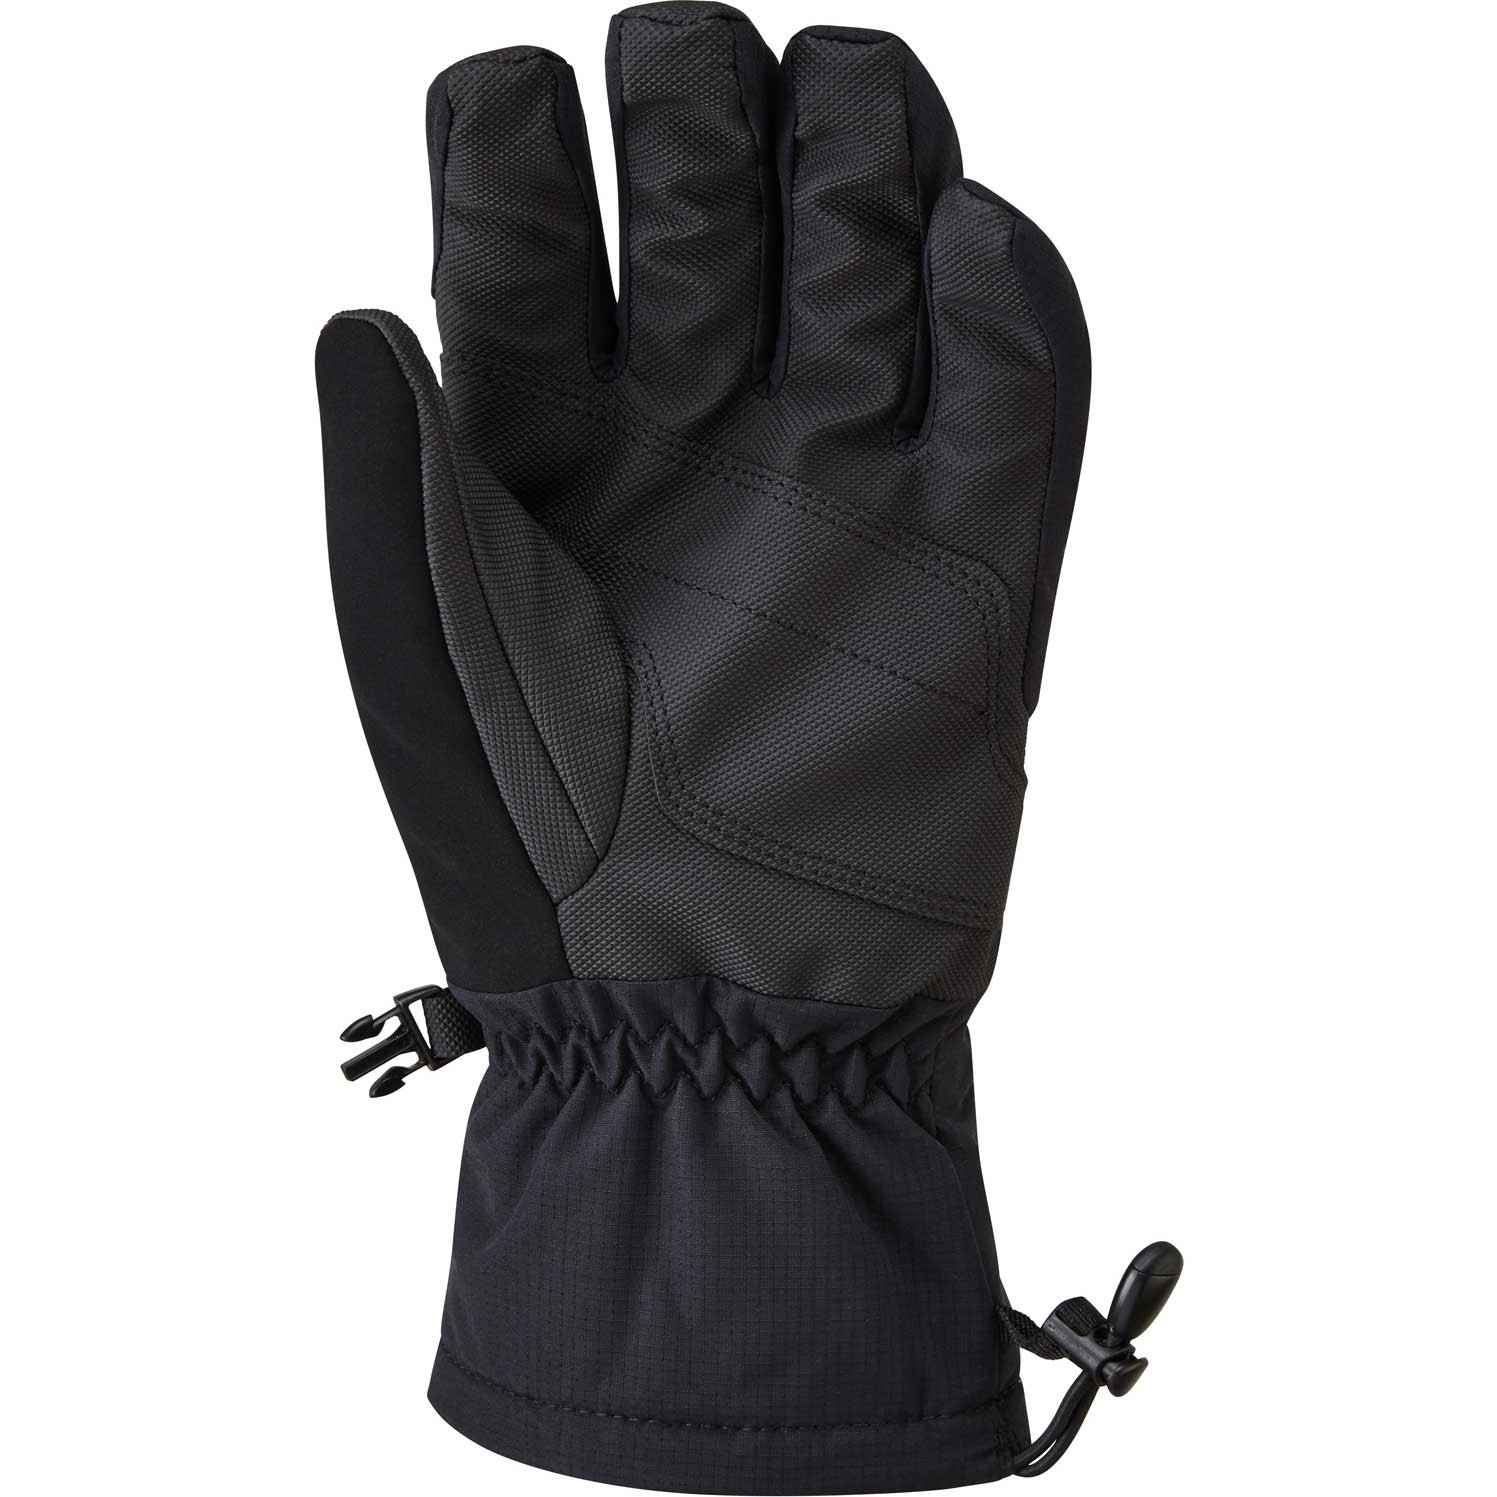 Rab Storm Glove - Women's - Black